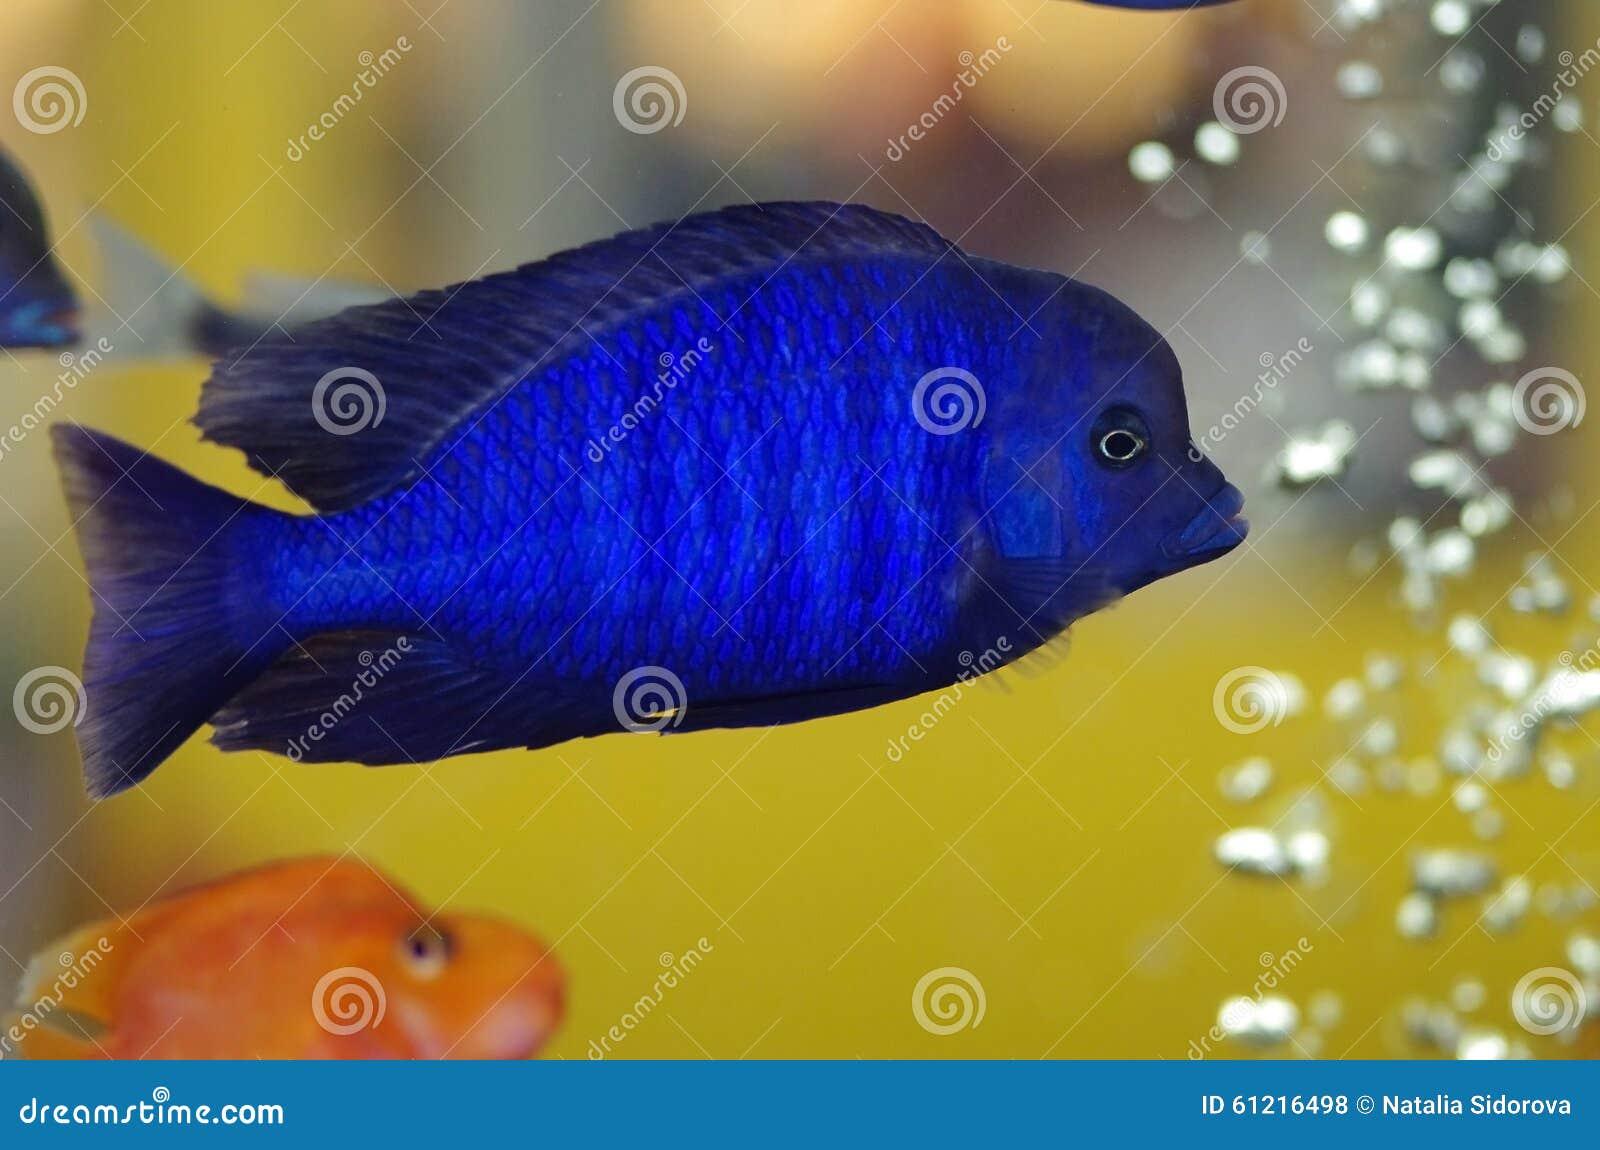 Malawi blue dolphin aquarium fish stock photo image for Blue fish aquarium